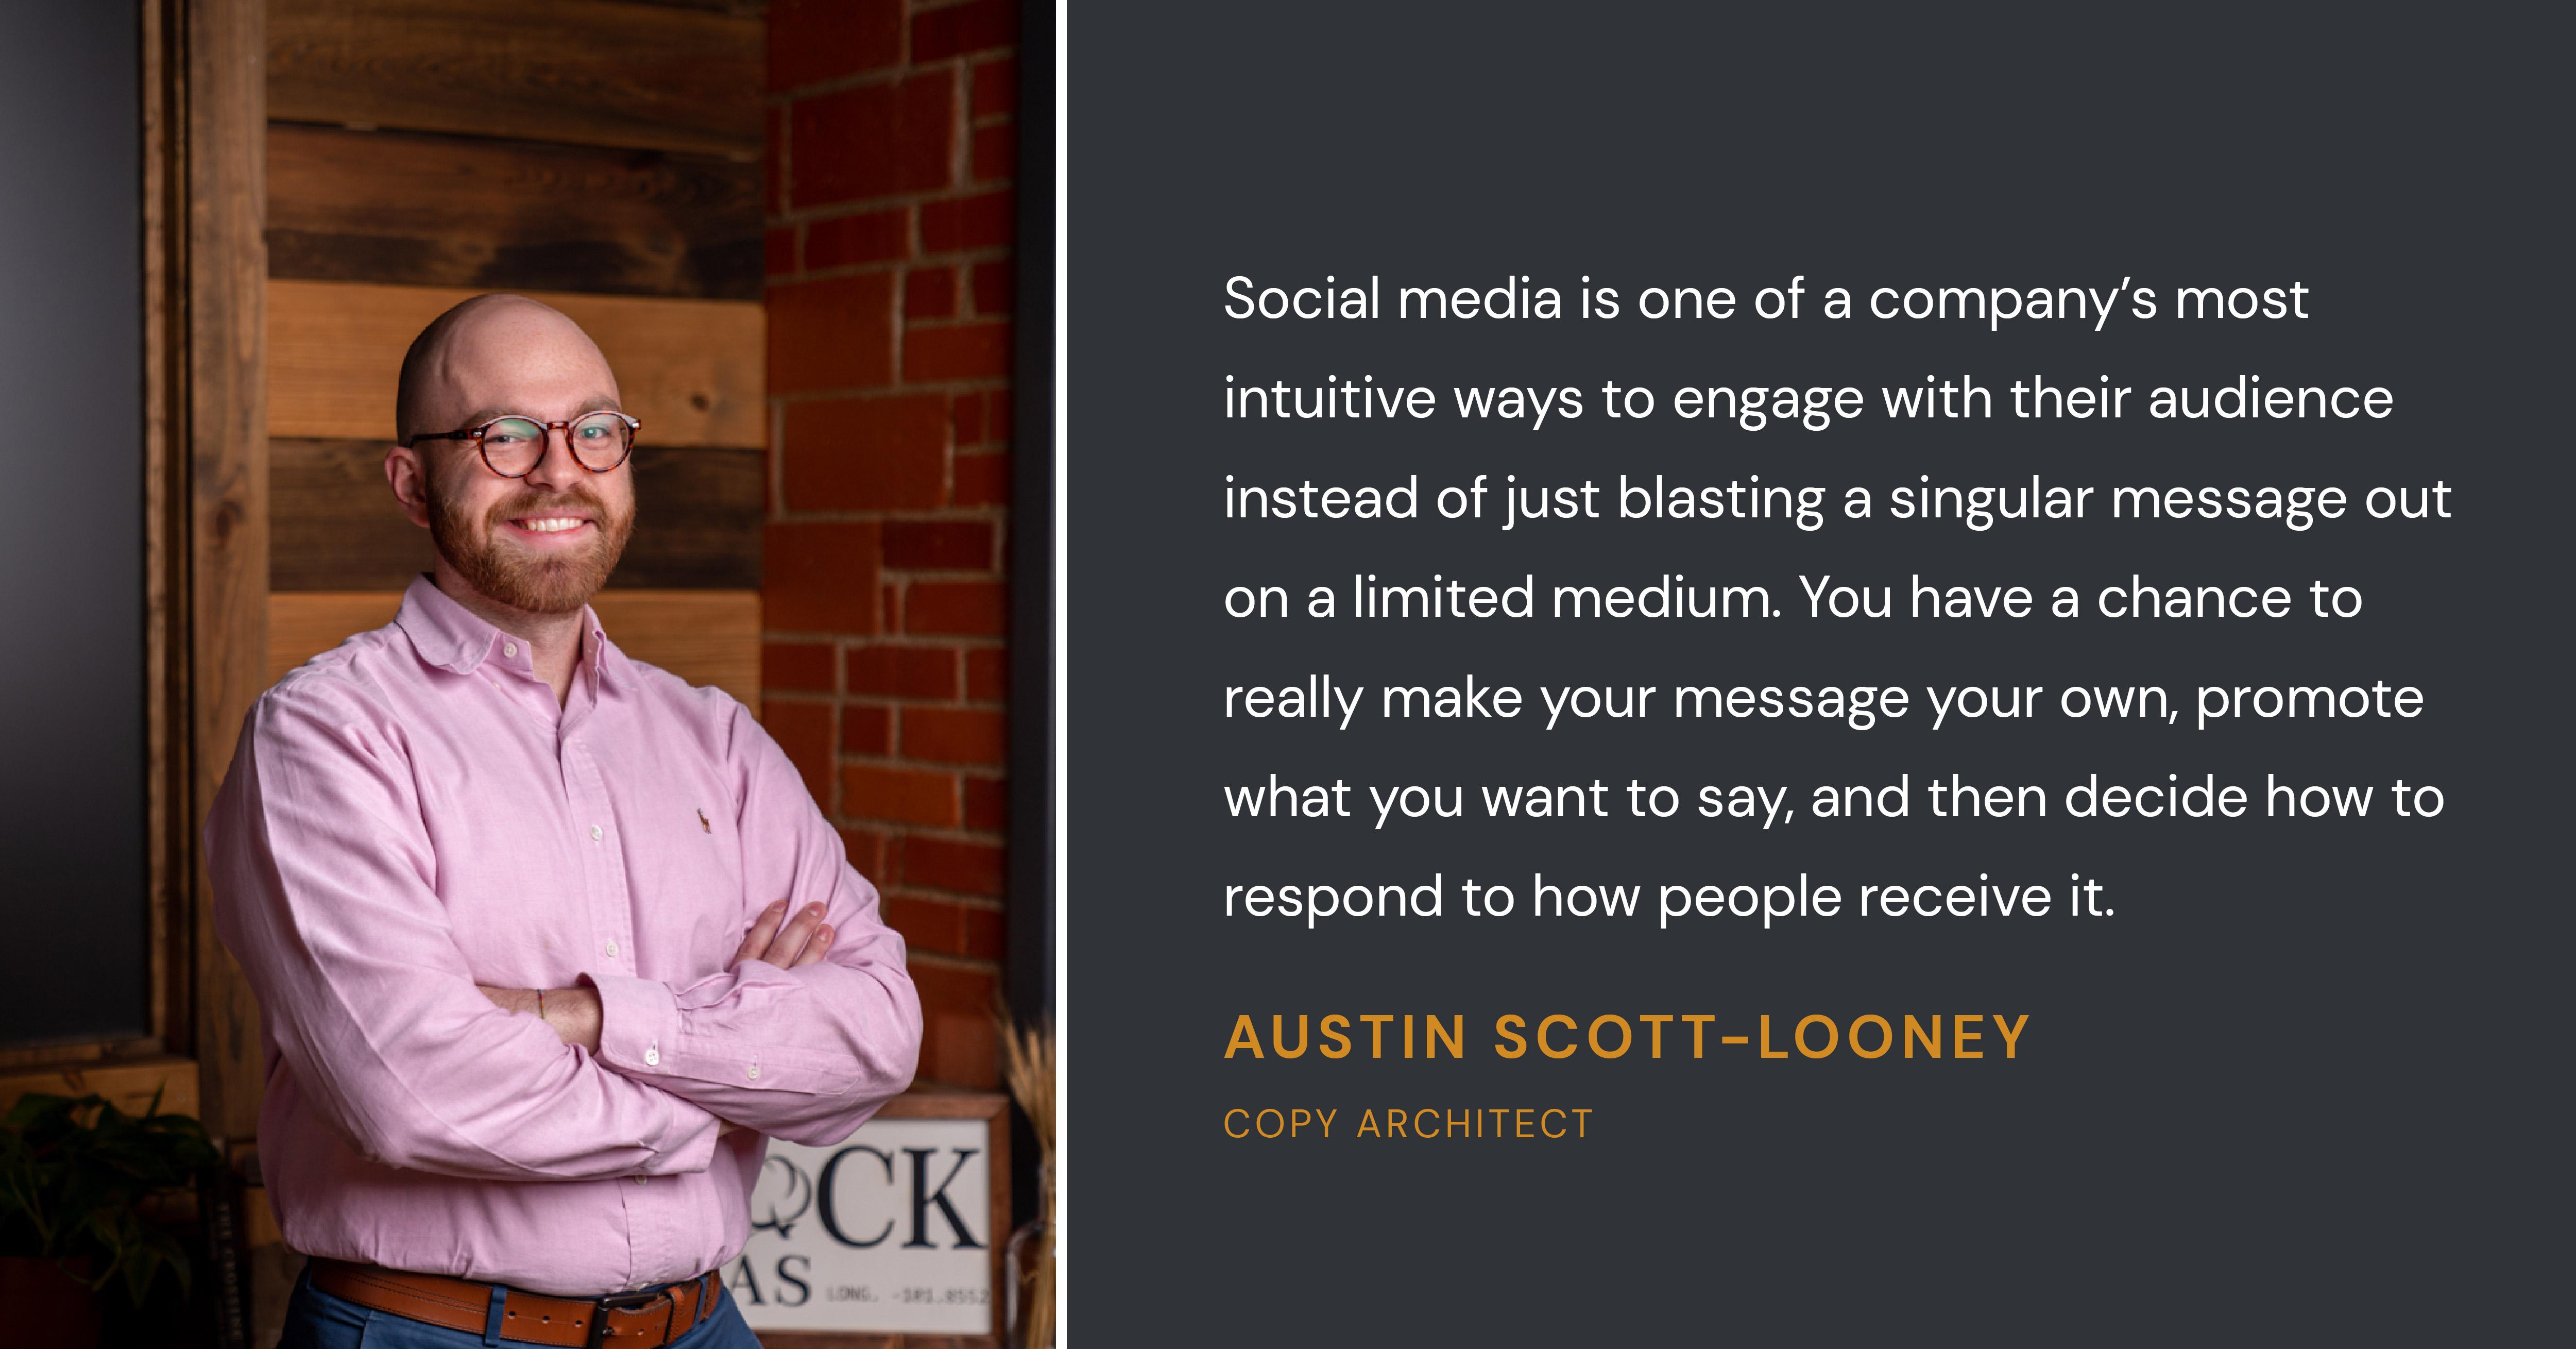 copy-architect-austin-scott-looney